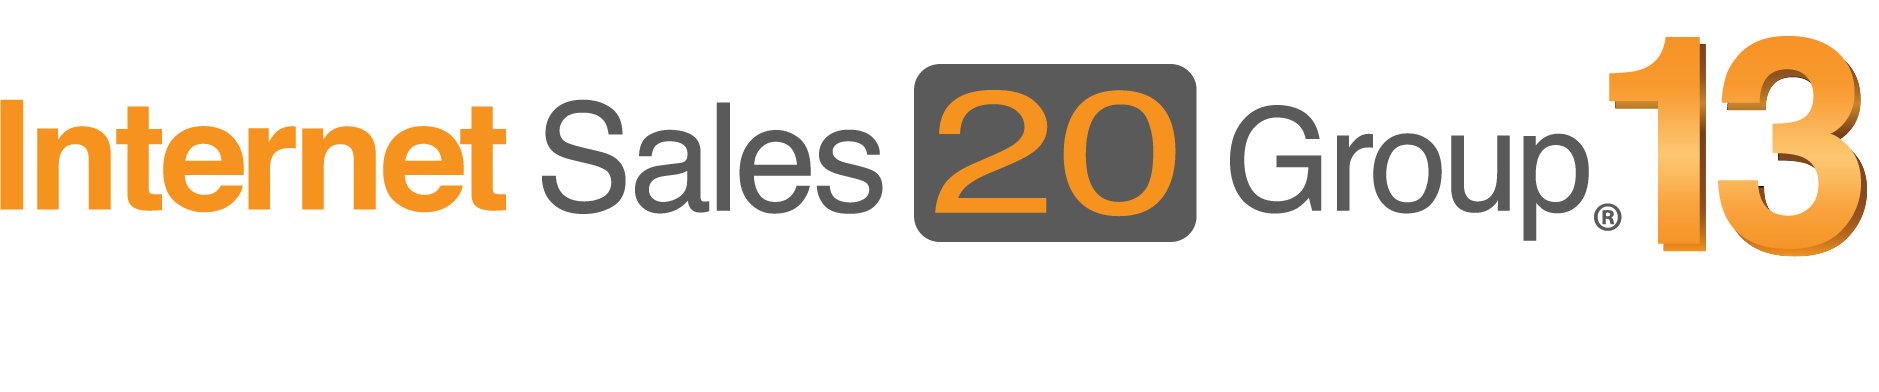 Internet Sales 20 Group Logo